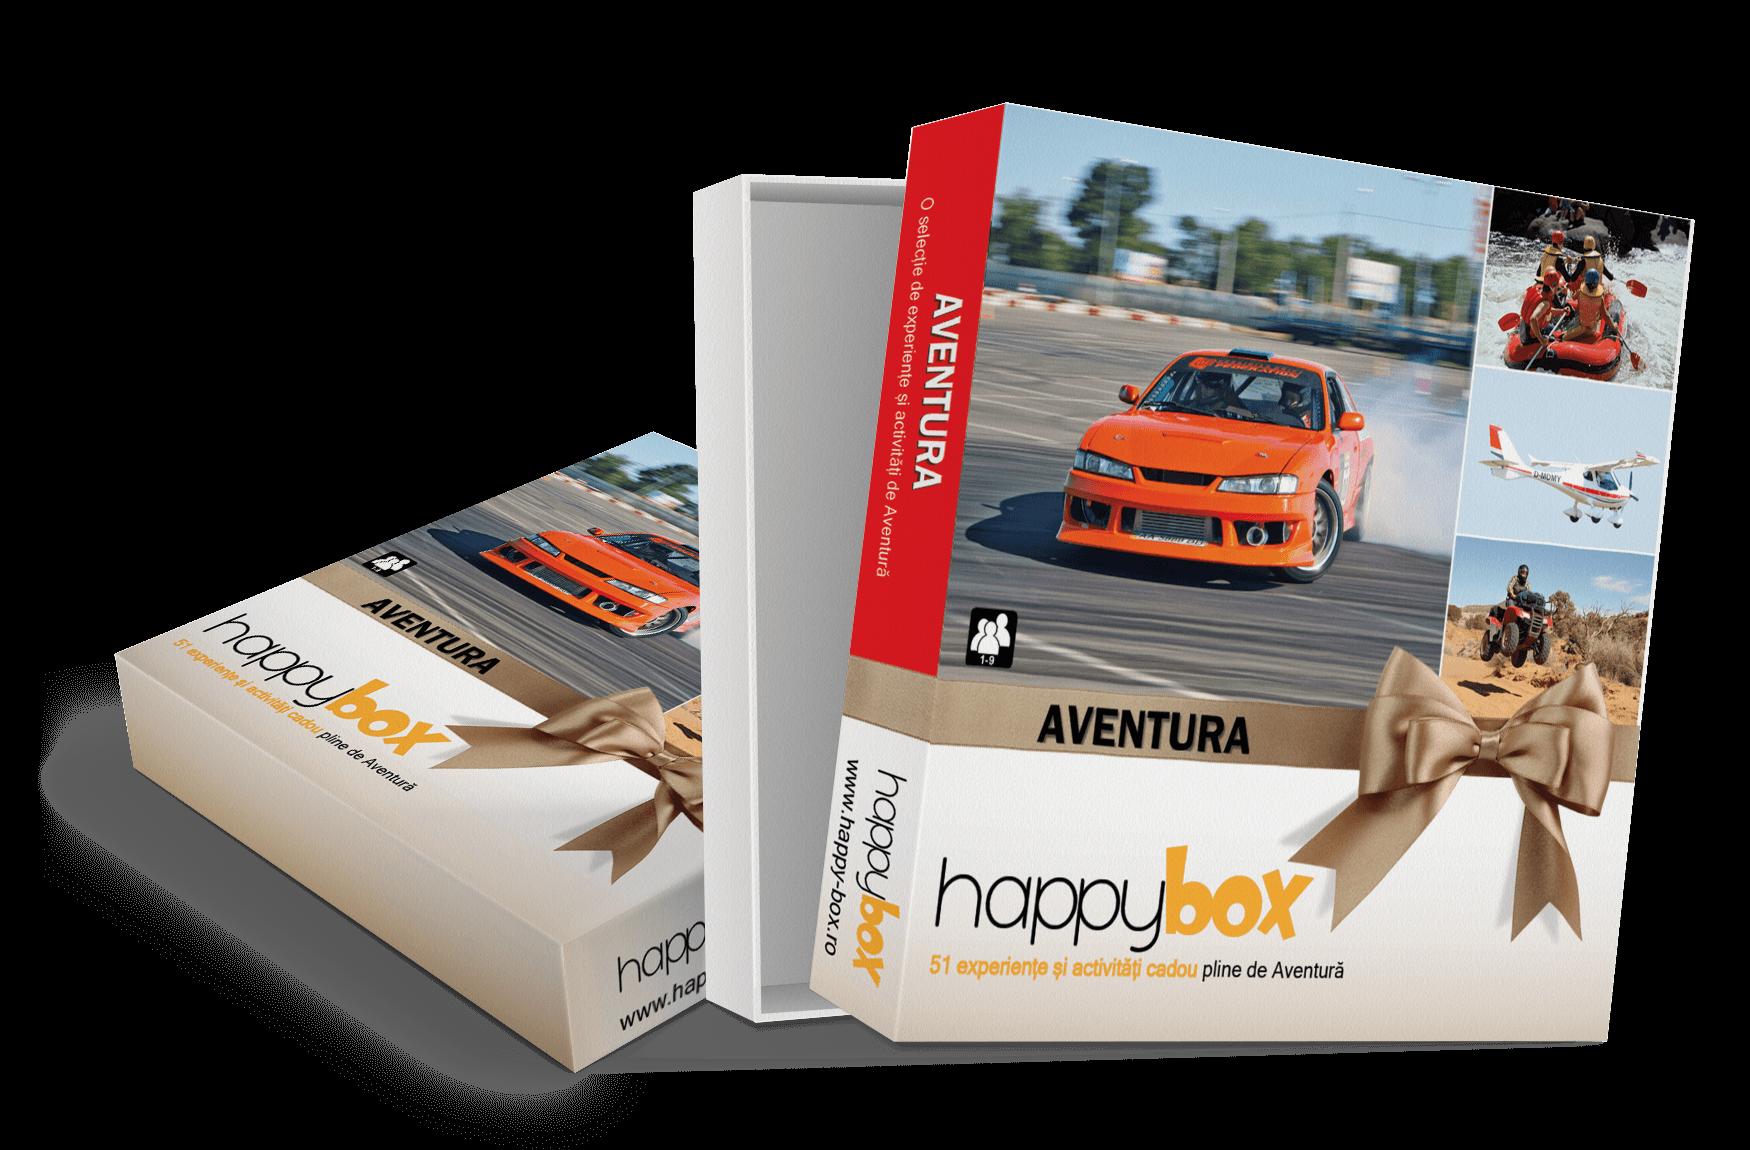 happybox_aventura-box